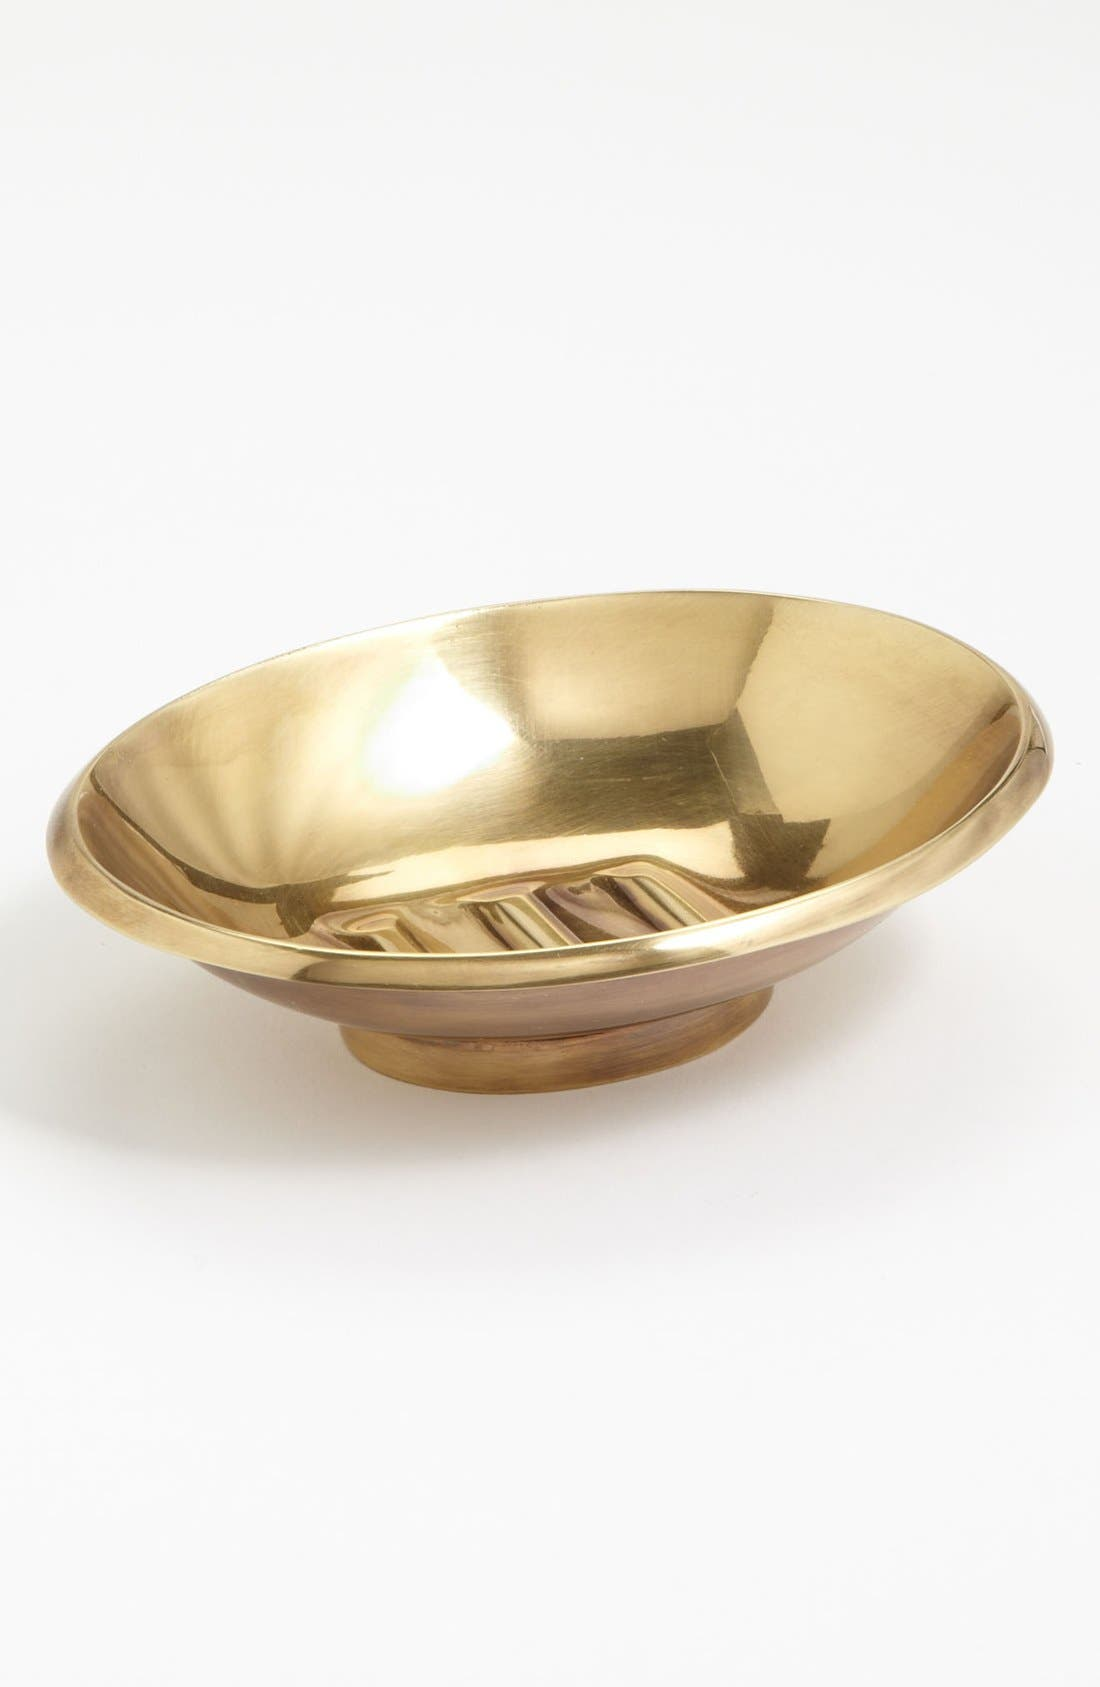 Main Image - Waterworks Studio 'Wallingford' Soap Dish (Online Only)